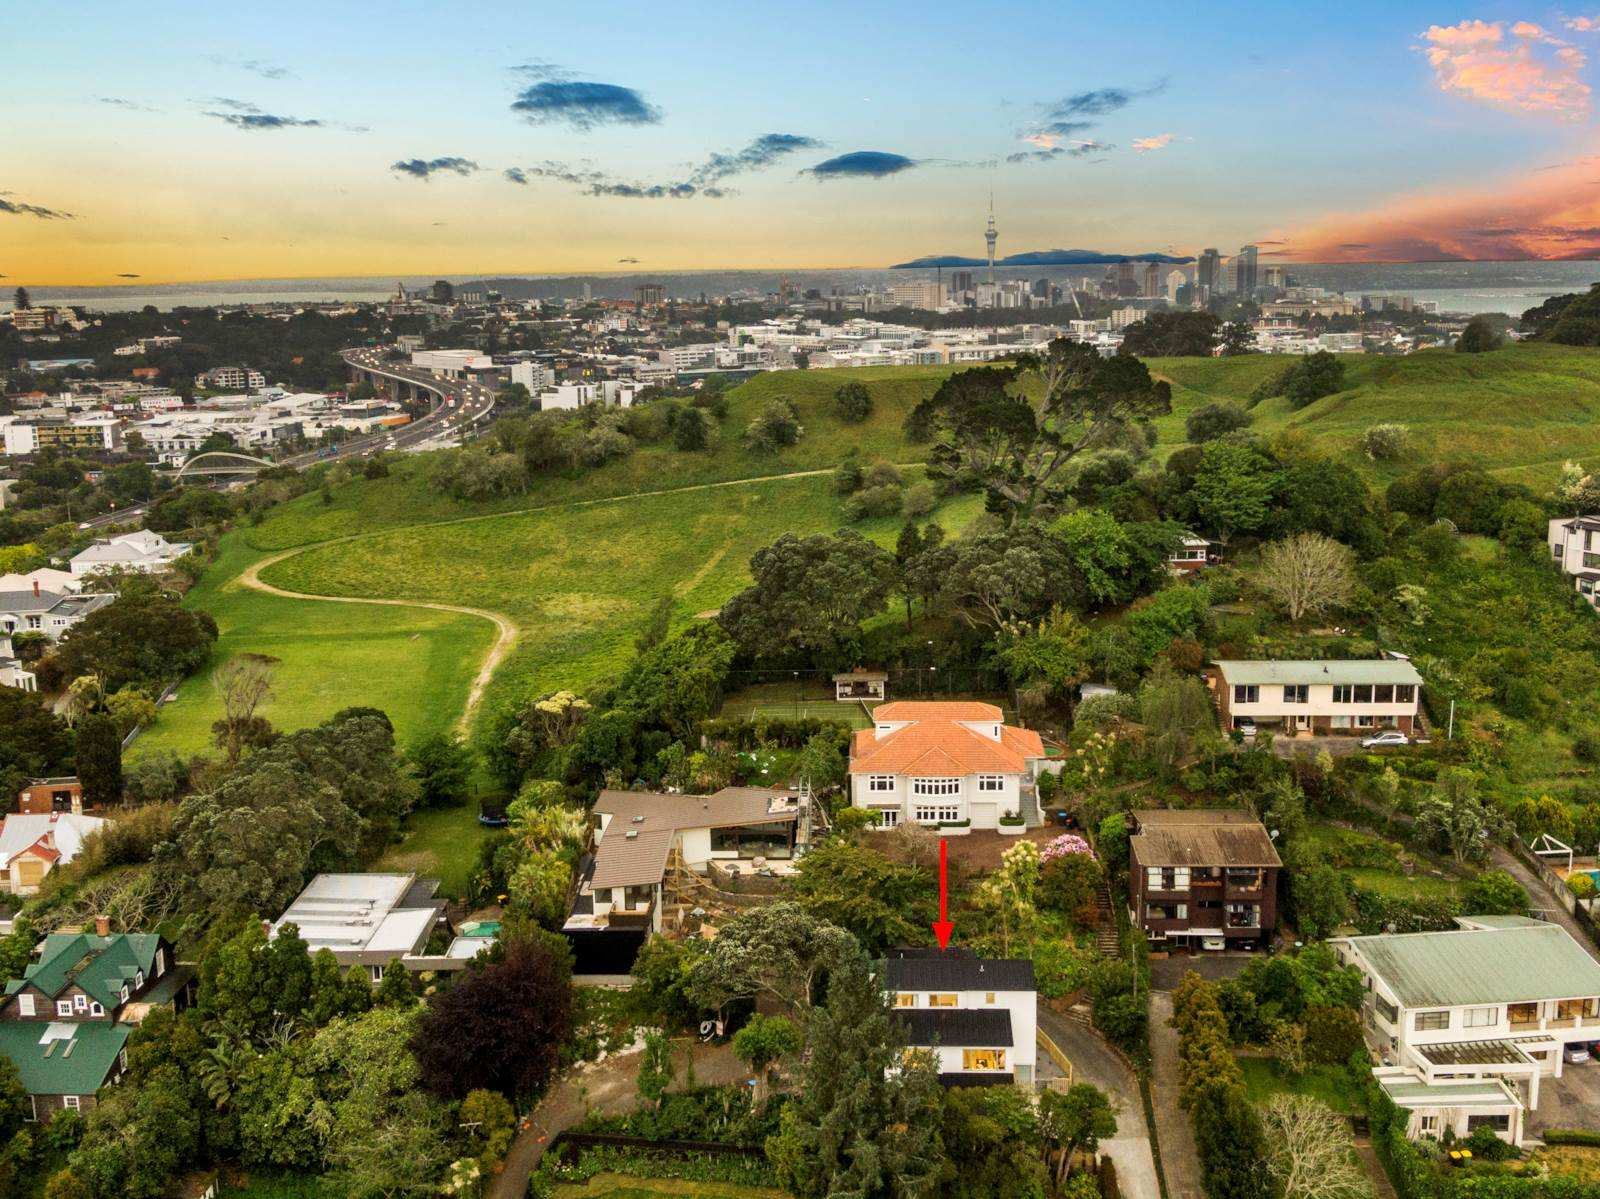 Remuera 4房 双校网全新奢居 享无敌视野 灵动舒阔格局 轻松上高速 静候慧眼买家! Huge GZ House, Panoramic Views